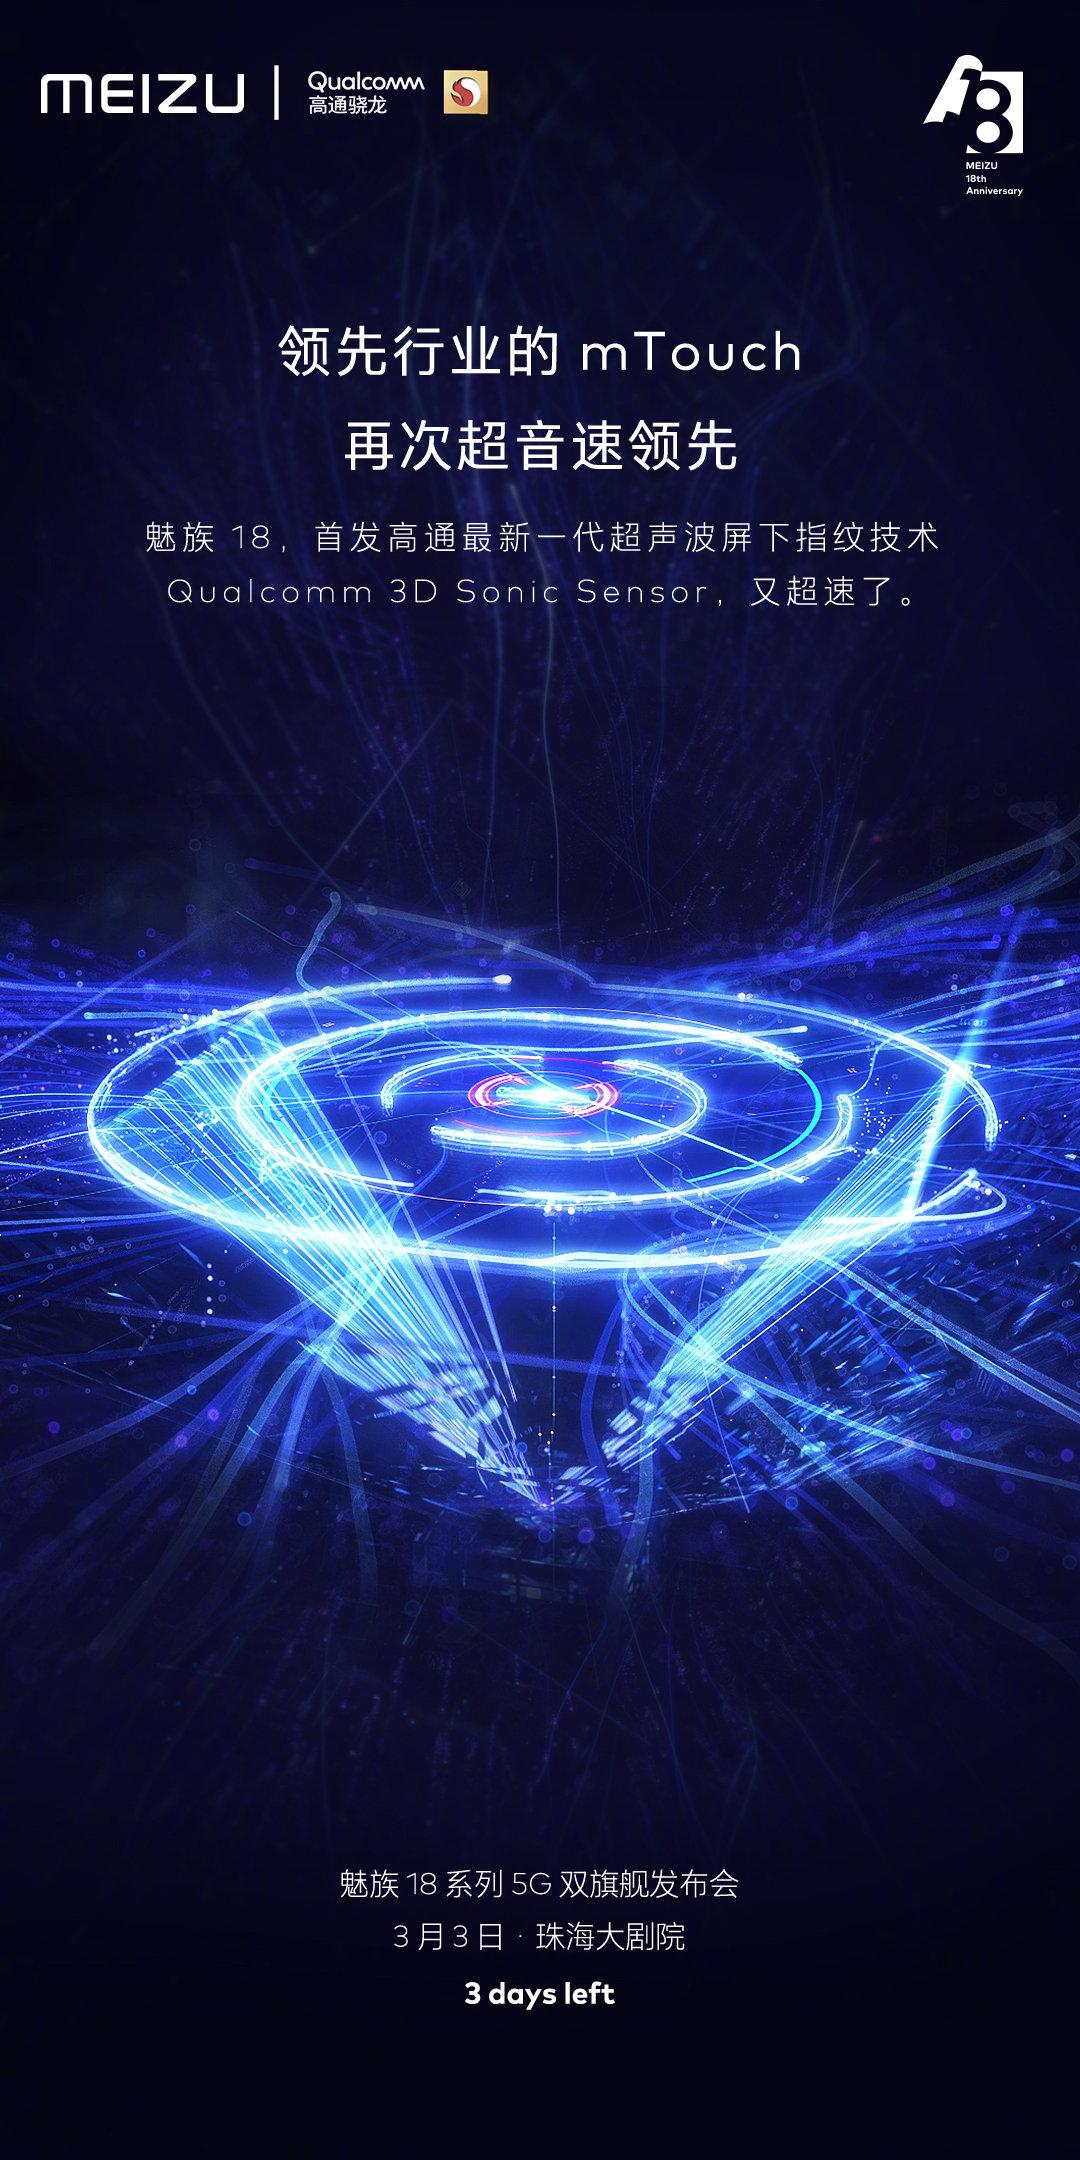 Meizu 18 Series debuts Qualcomm's 3D Sonic Sensor 2nd Generation